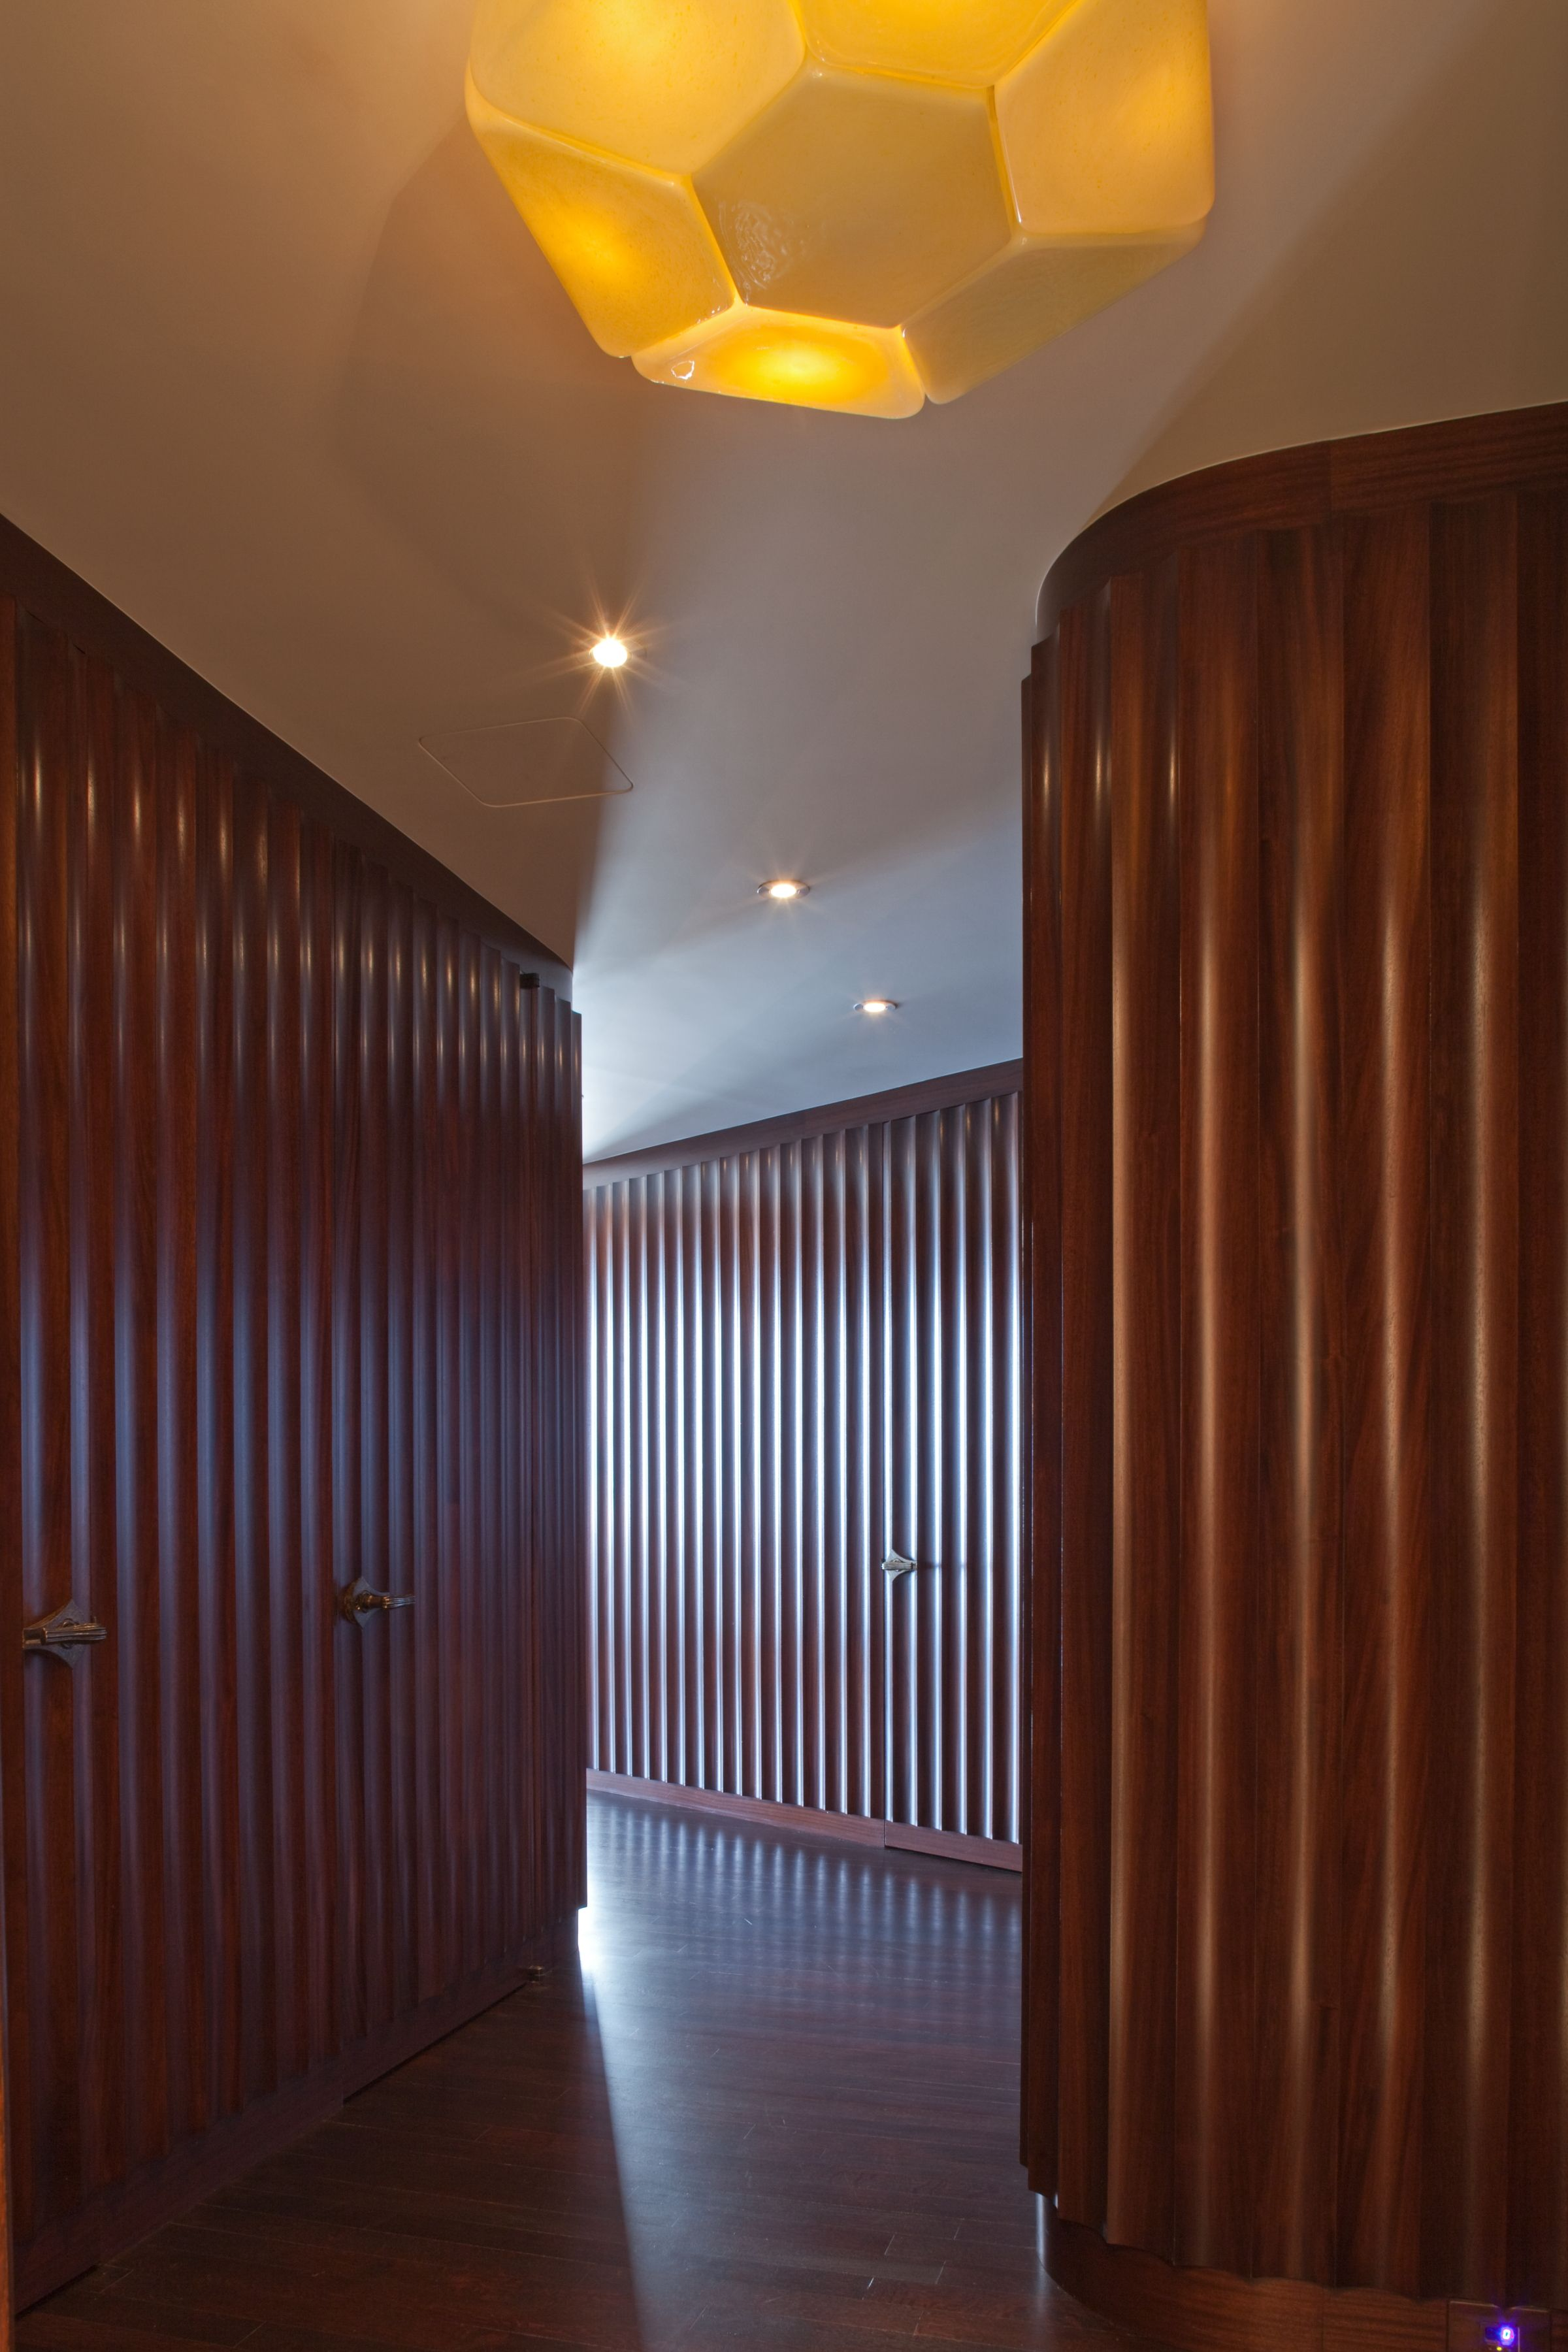 Wood Paneled Room Design: Custom Wood Paneled Wall, Curved Wood Paneled Wall